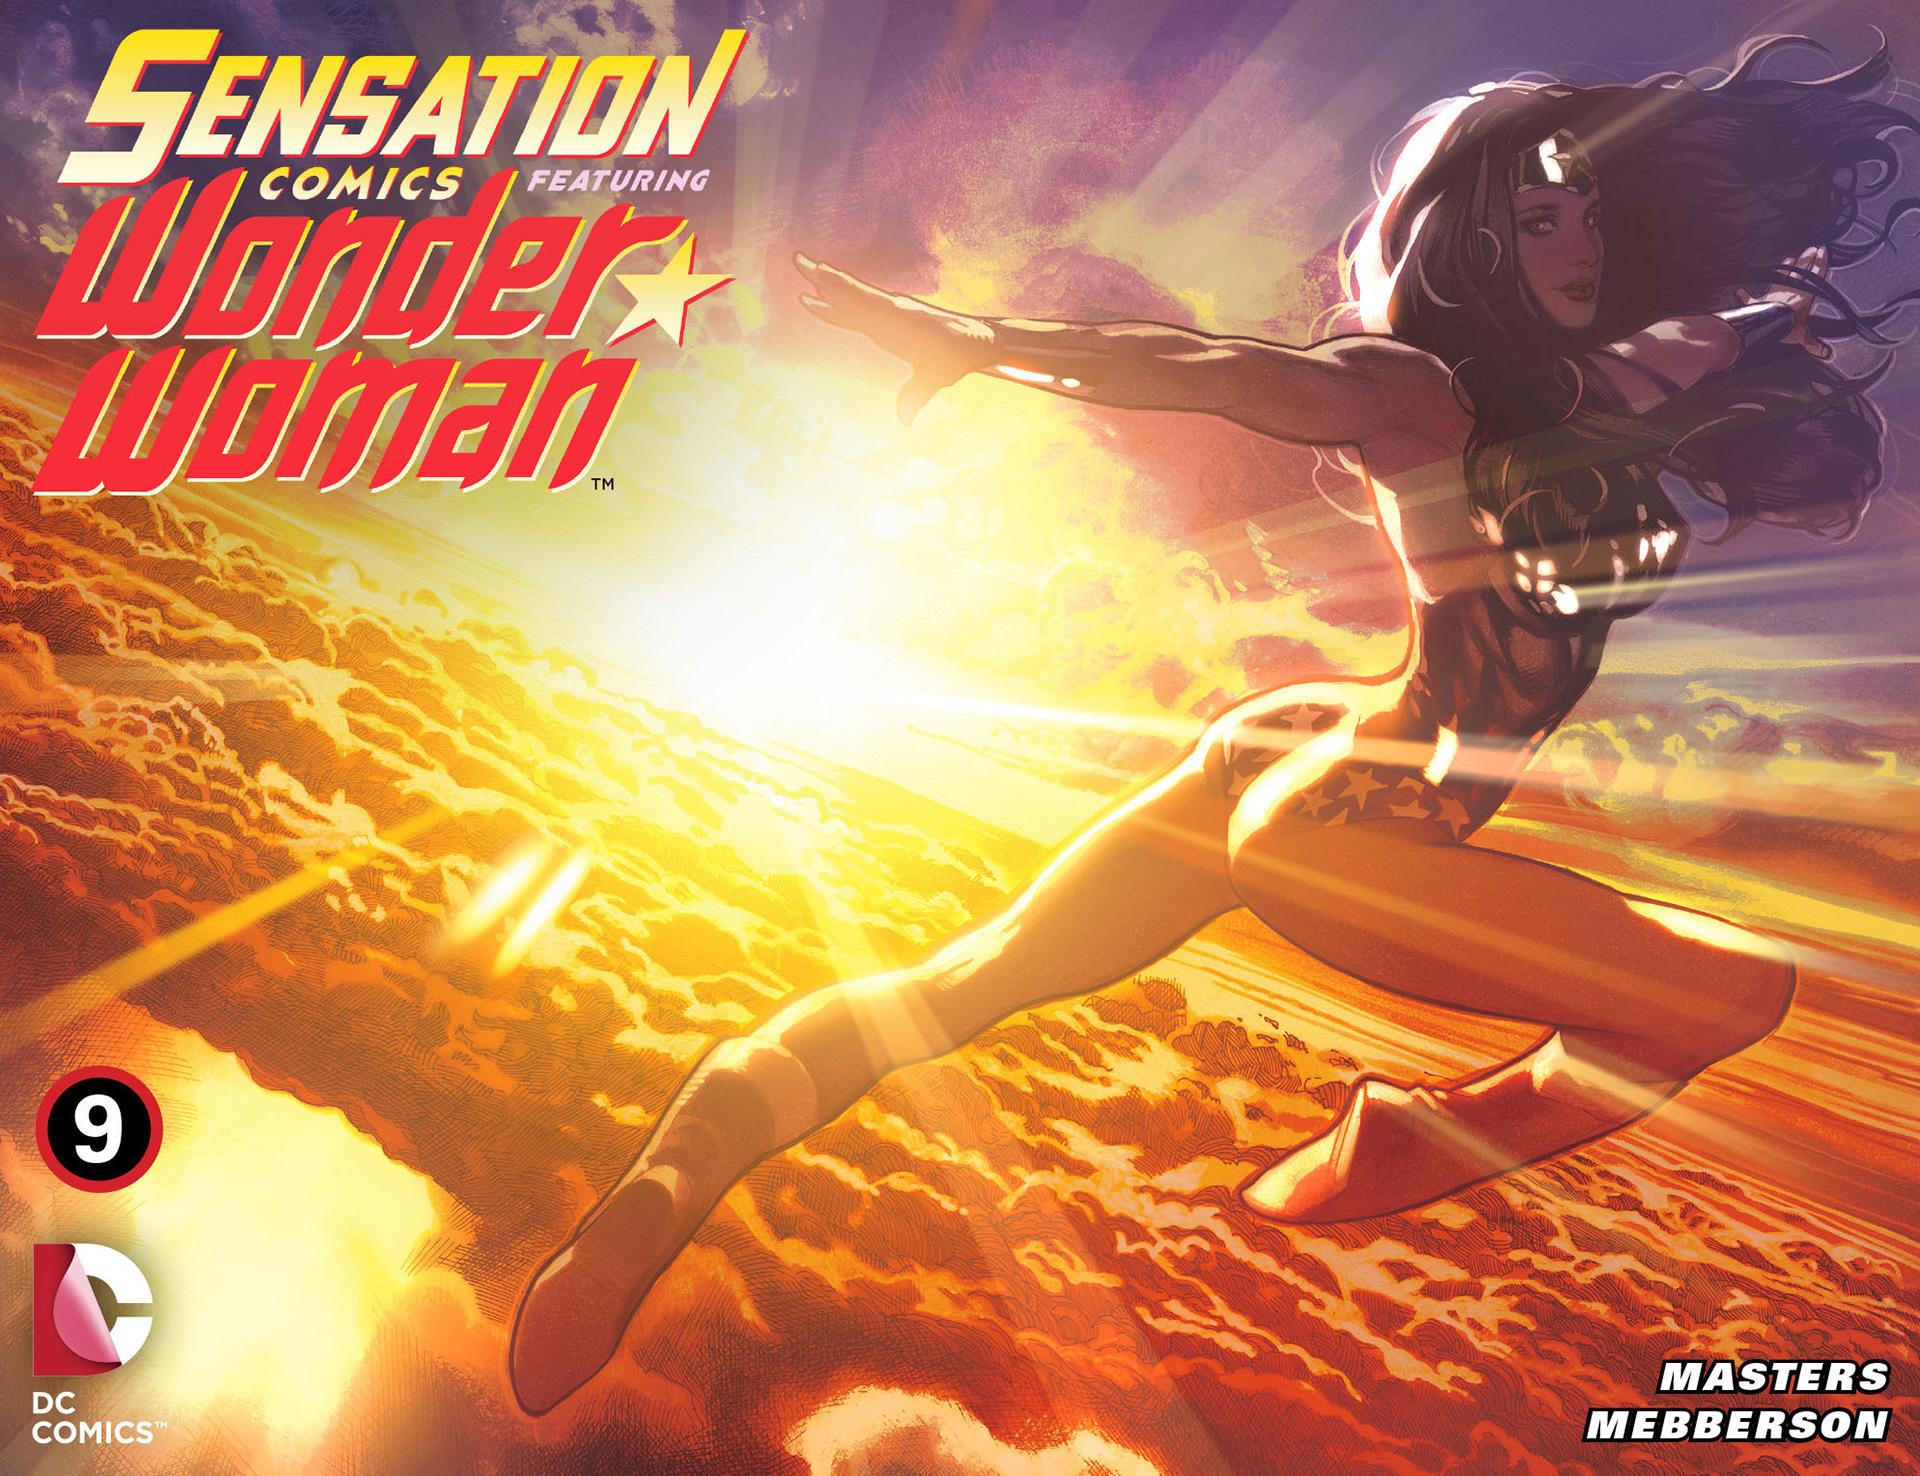 Read online Sensation Comics Featuring Wonder Woman comic -  Issue #9 - 1